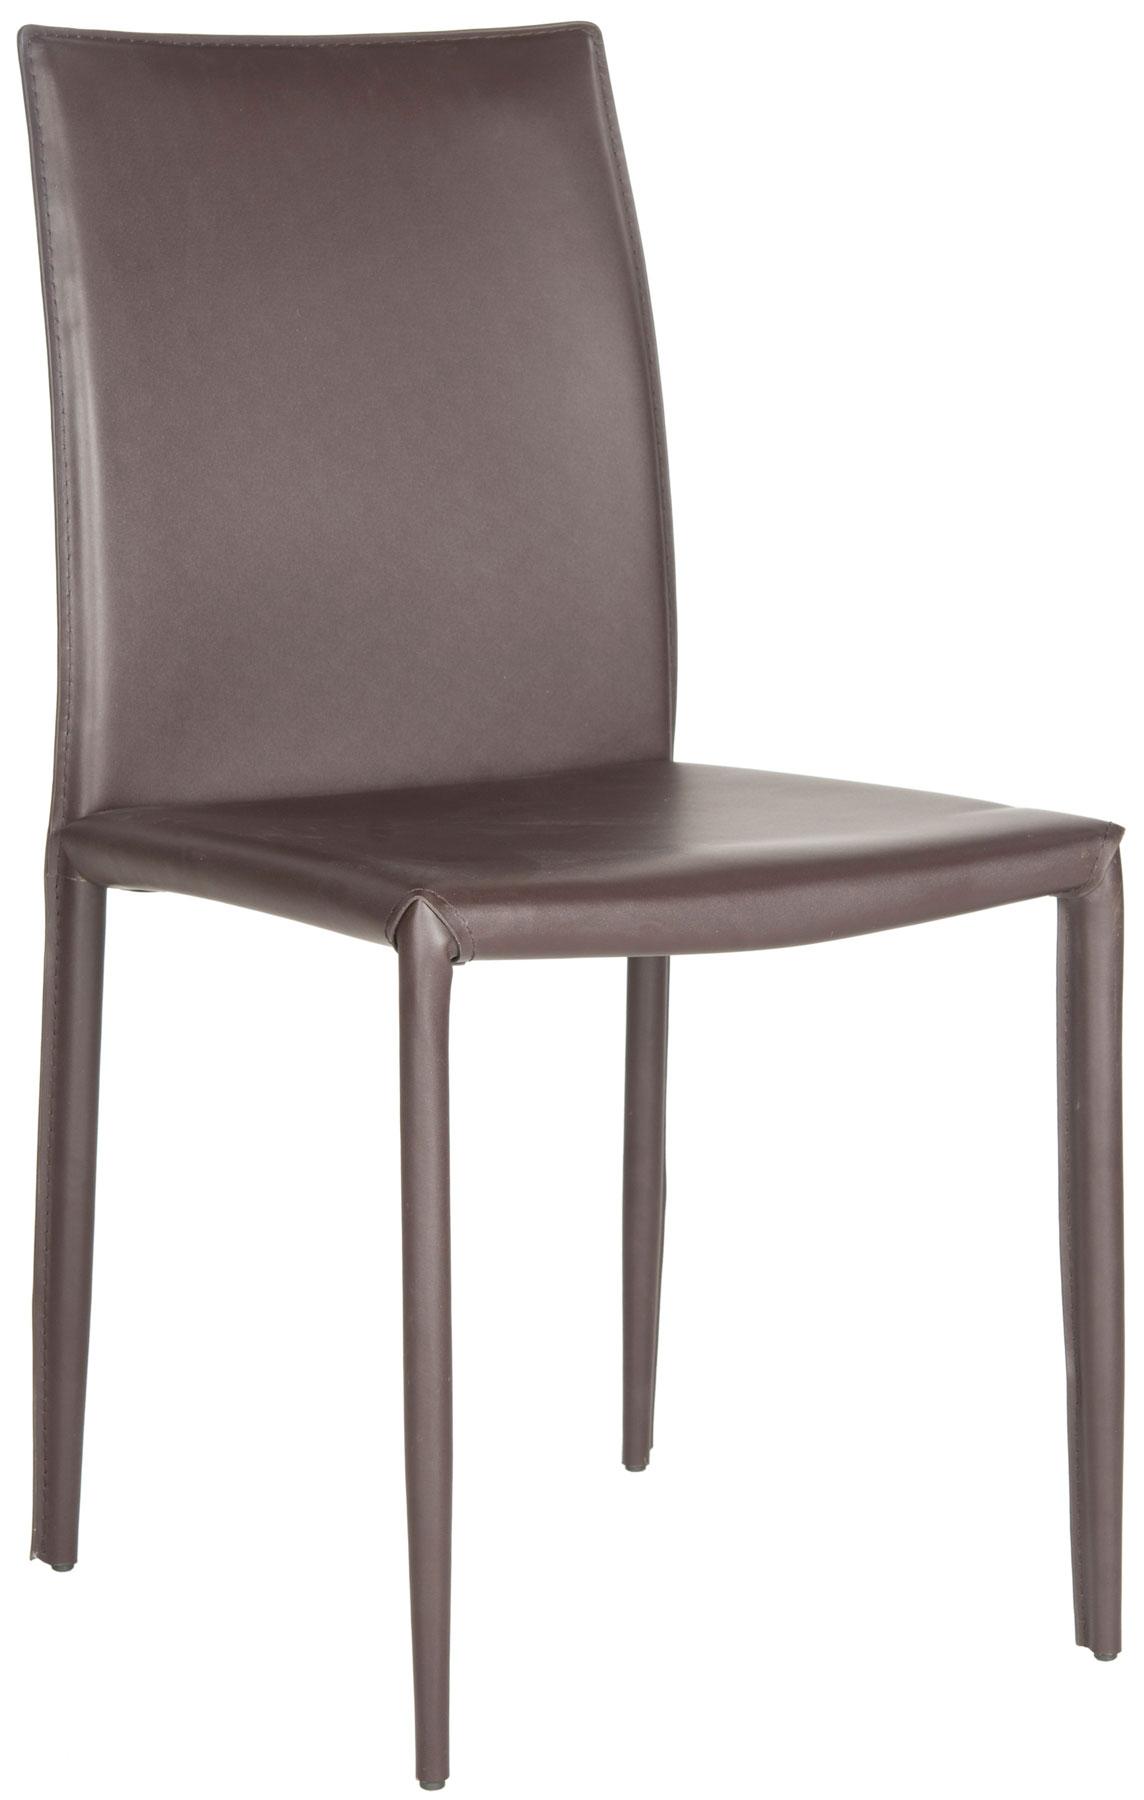 safavieh karna dining chair school bean bag chairs fox2009h set2 furniture by